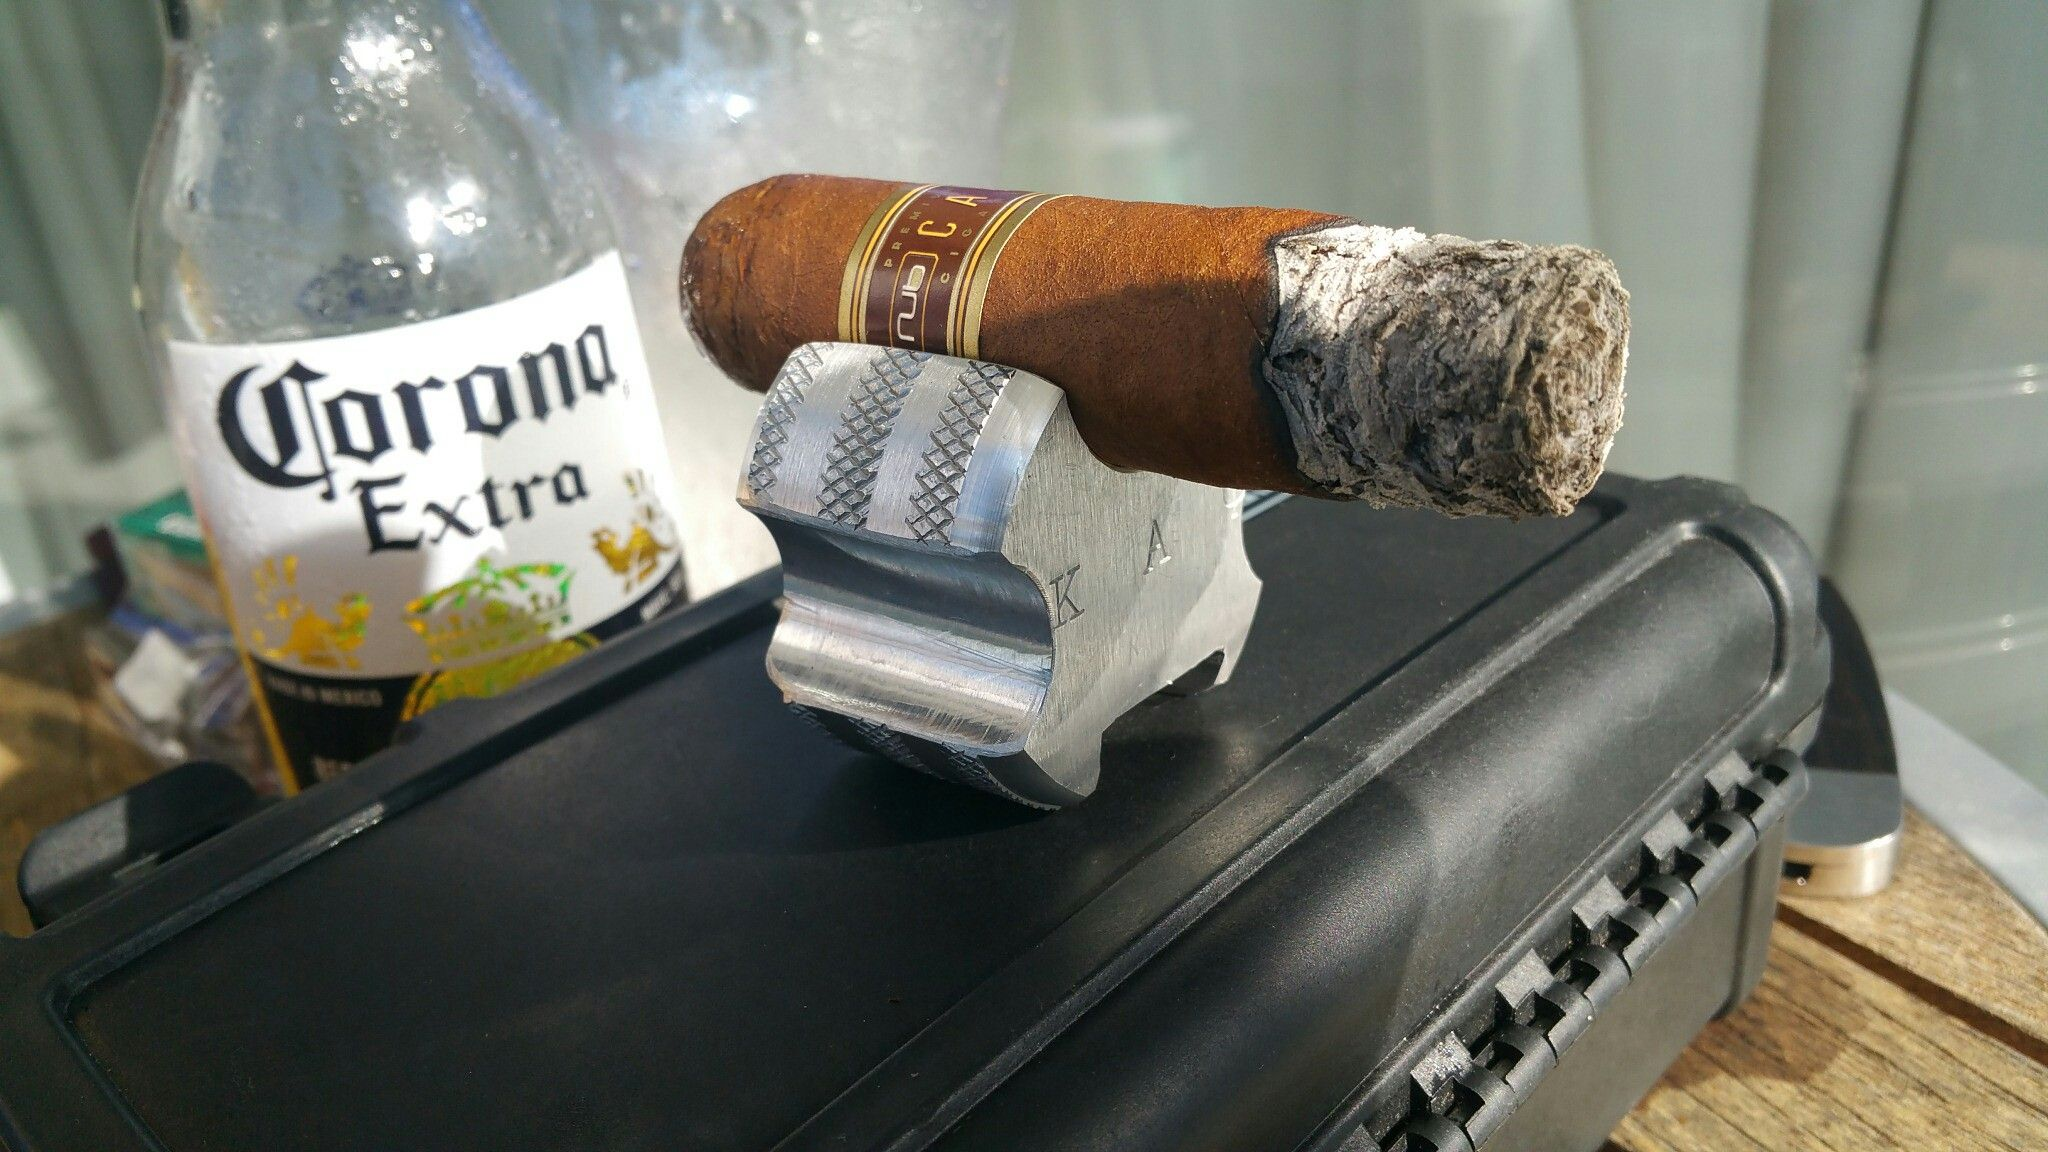 Staylitttsiestas.com Executive Cigar Holders $35 Square